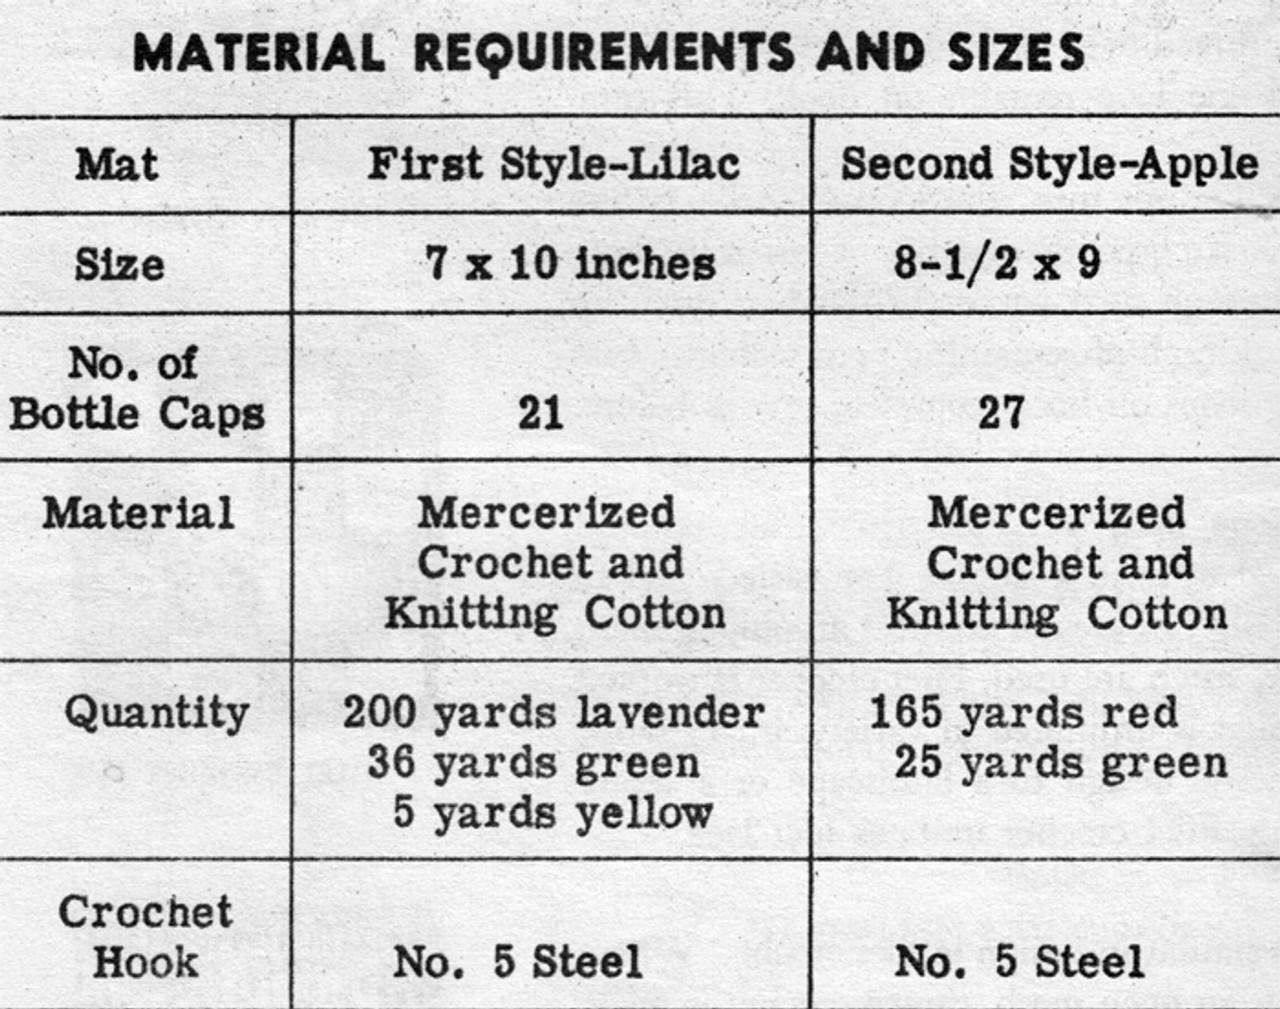 Material For Bottle Cap Crochet Mats